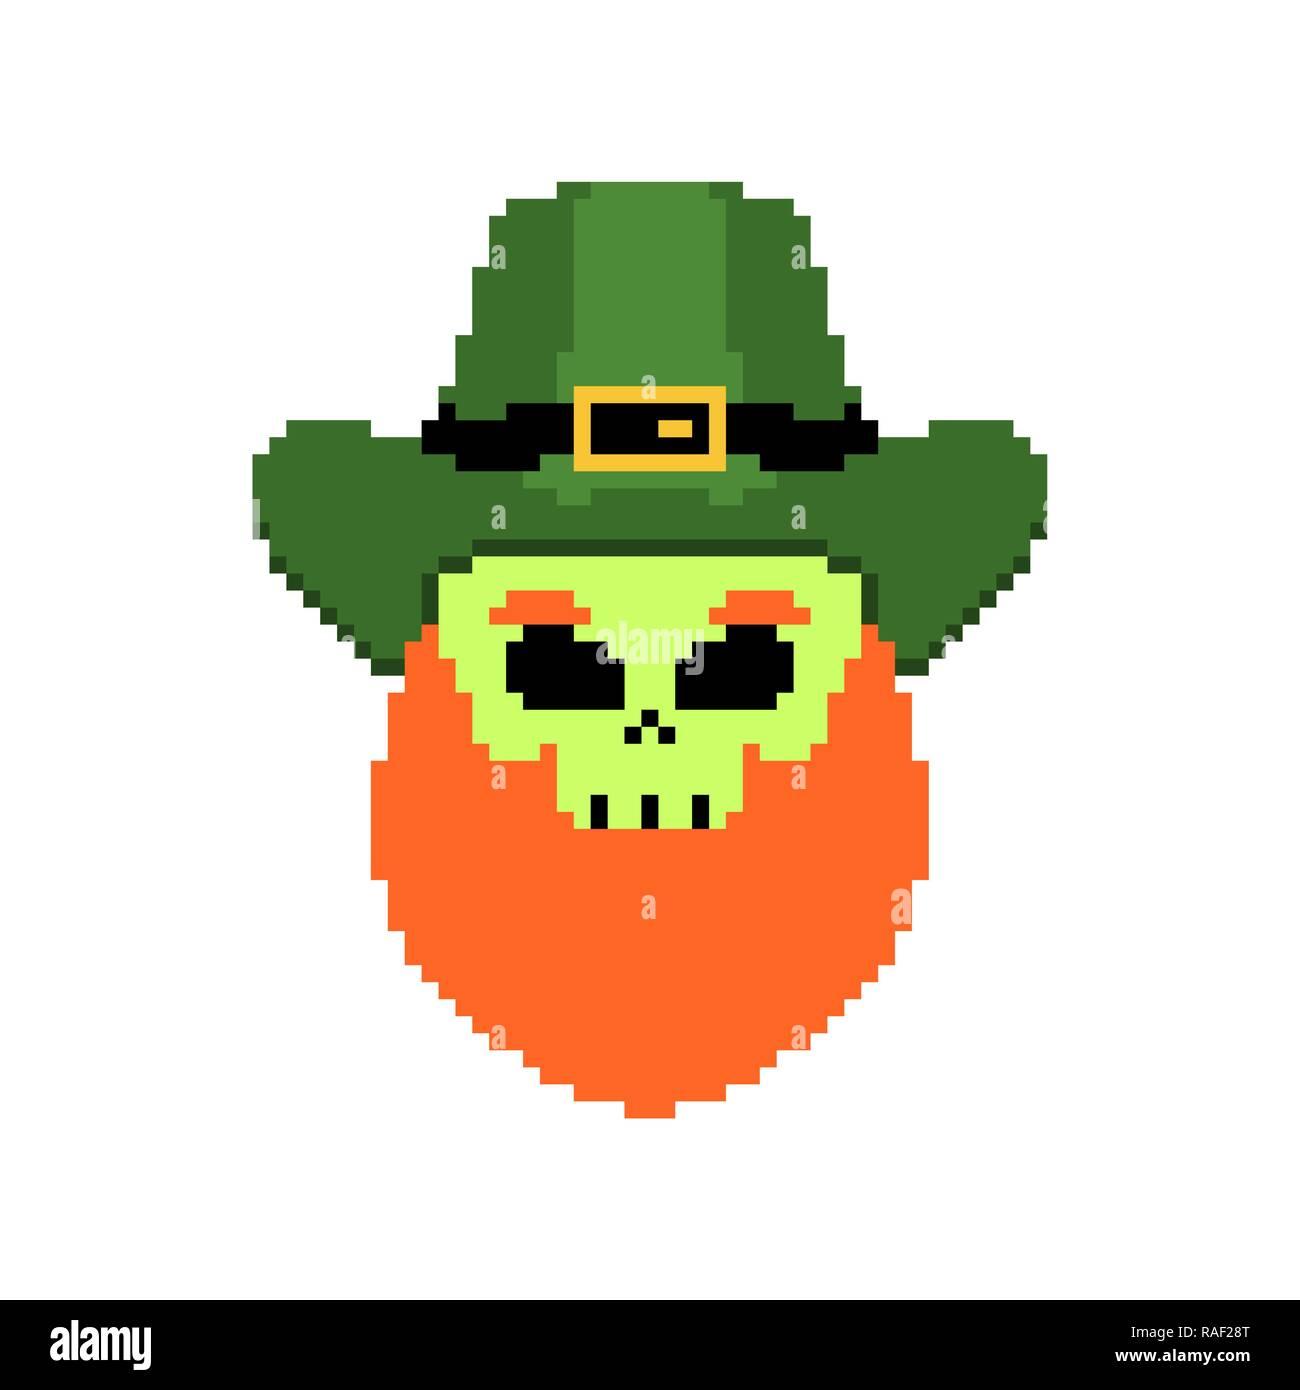 79e1edaee Skull of Leprechaun pixel art. Skeleton head with beard. Holiday of  Ireland. St